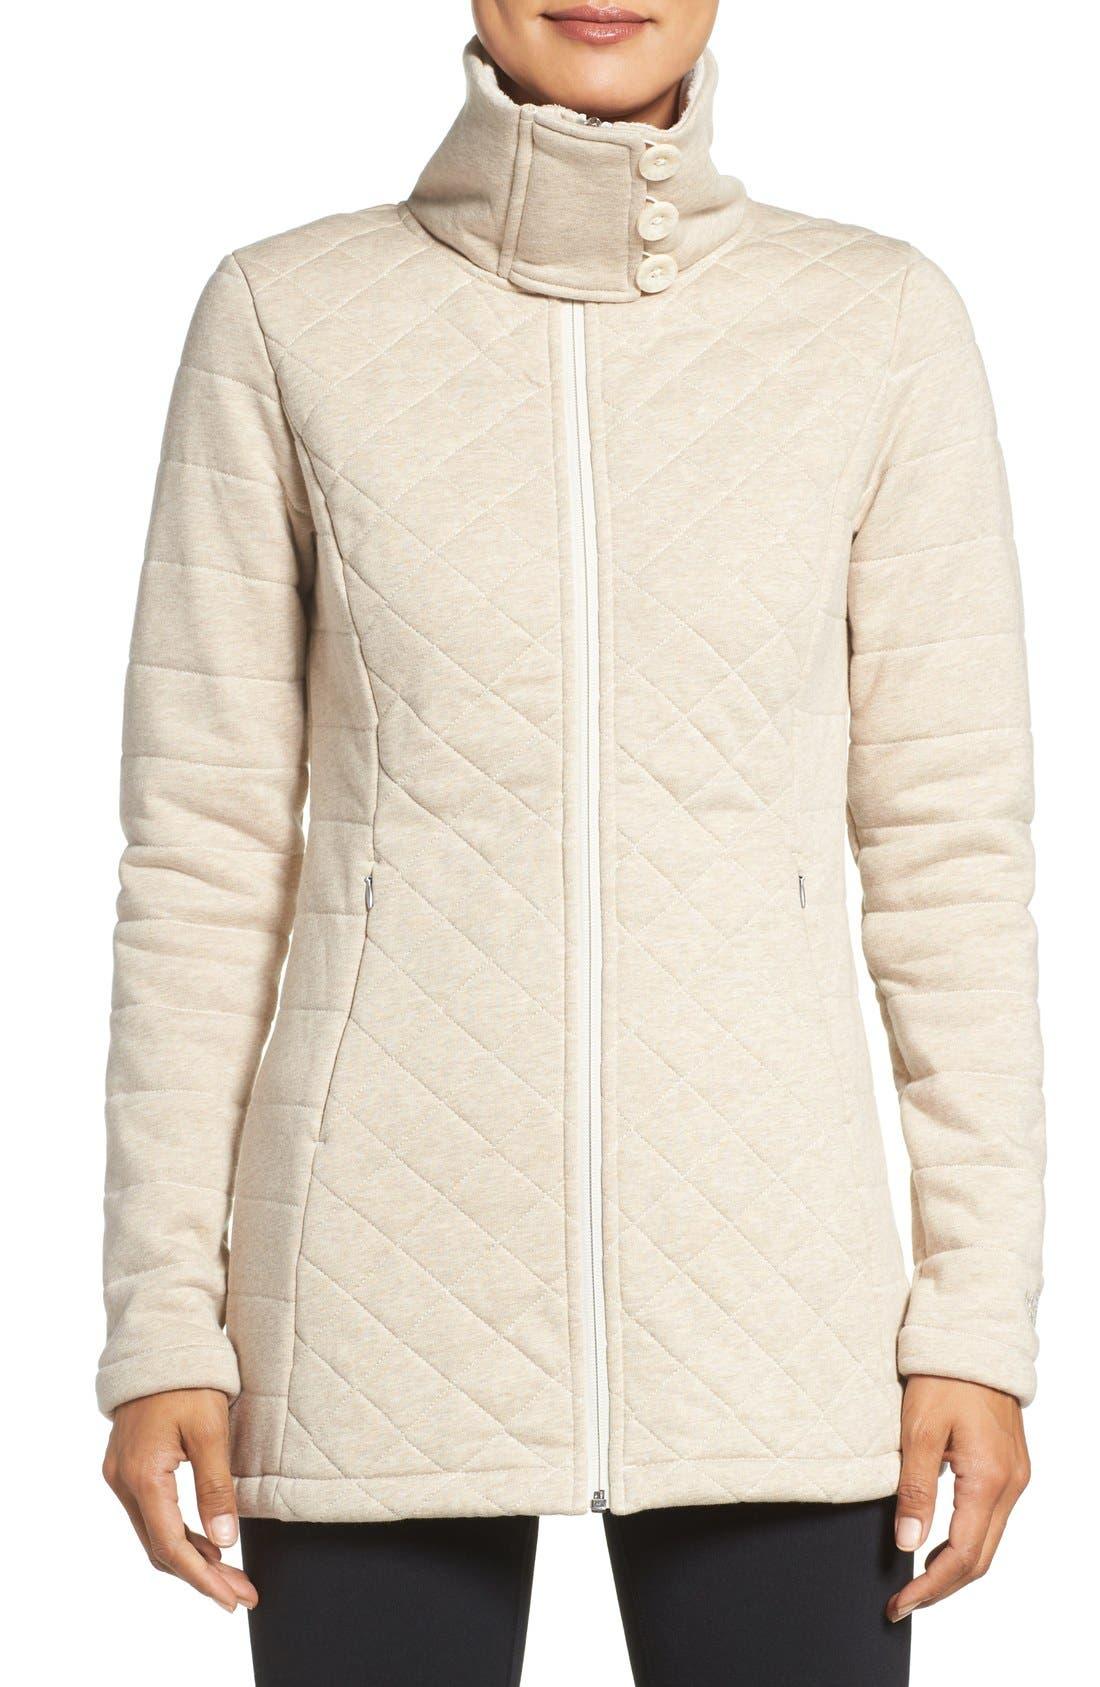 Alternate Image 1 Selected - The North Face 'Caroluna' Fleece Jacket